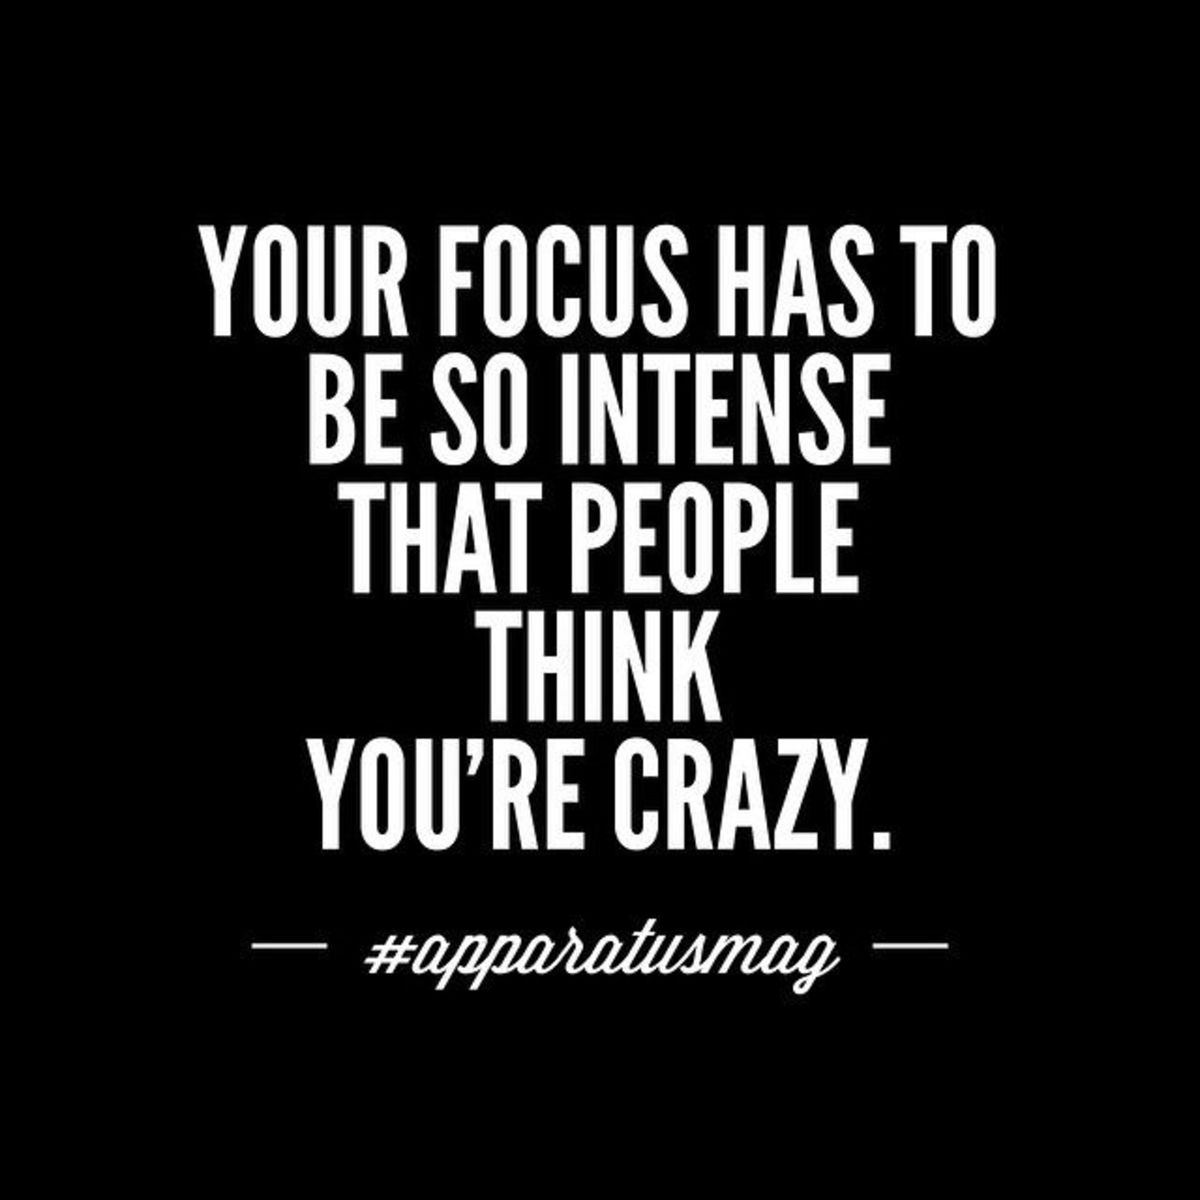 Limitless Focus on something is intense focus